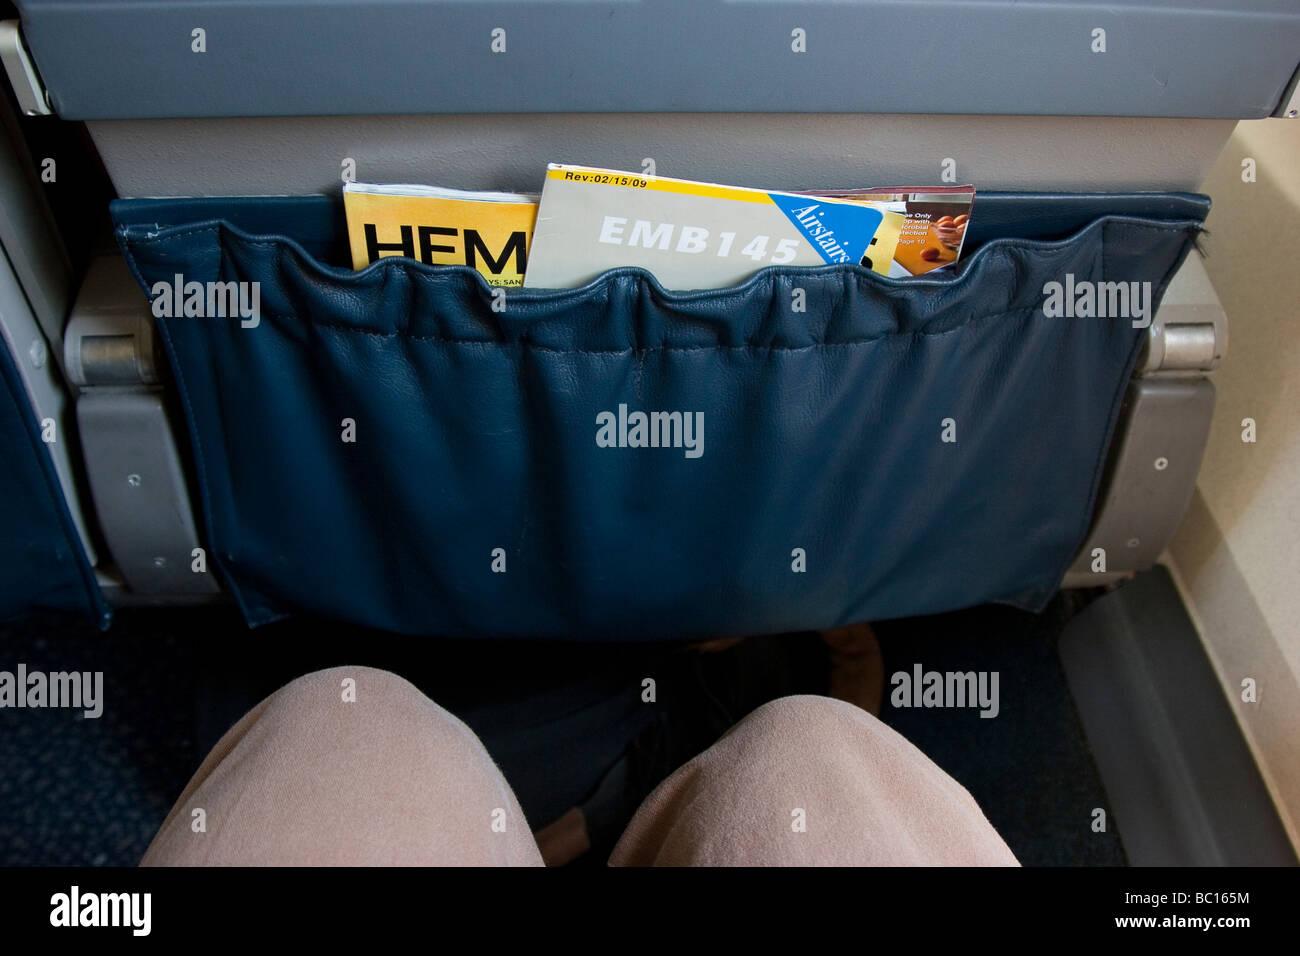 Lack of leg-room in airplane economy seat - Stock Image